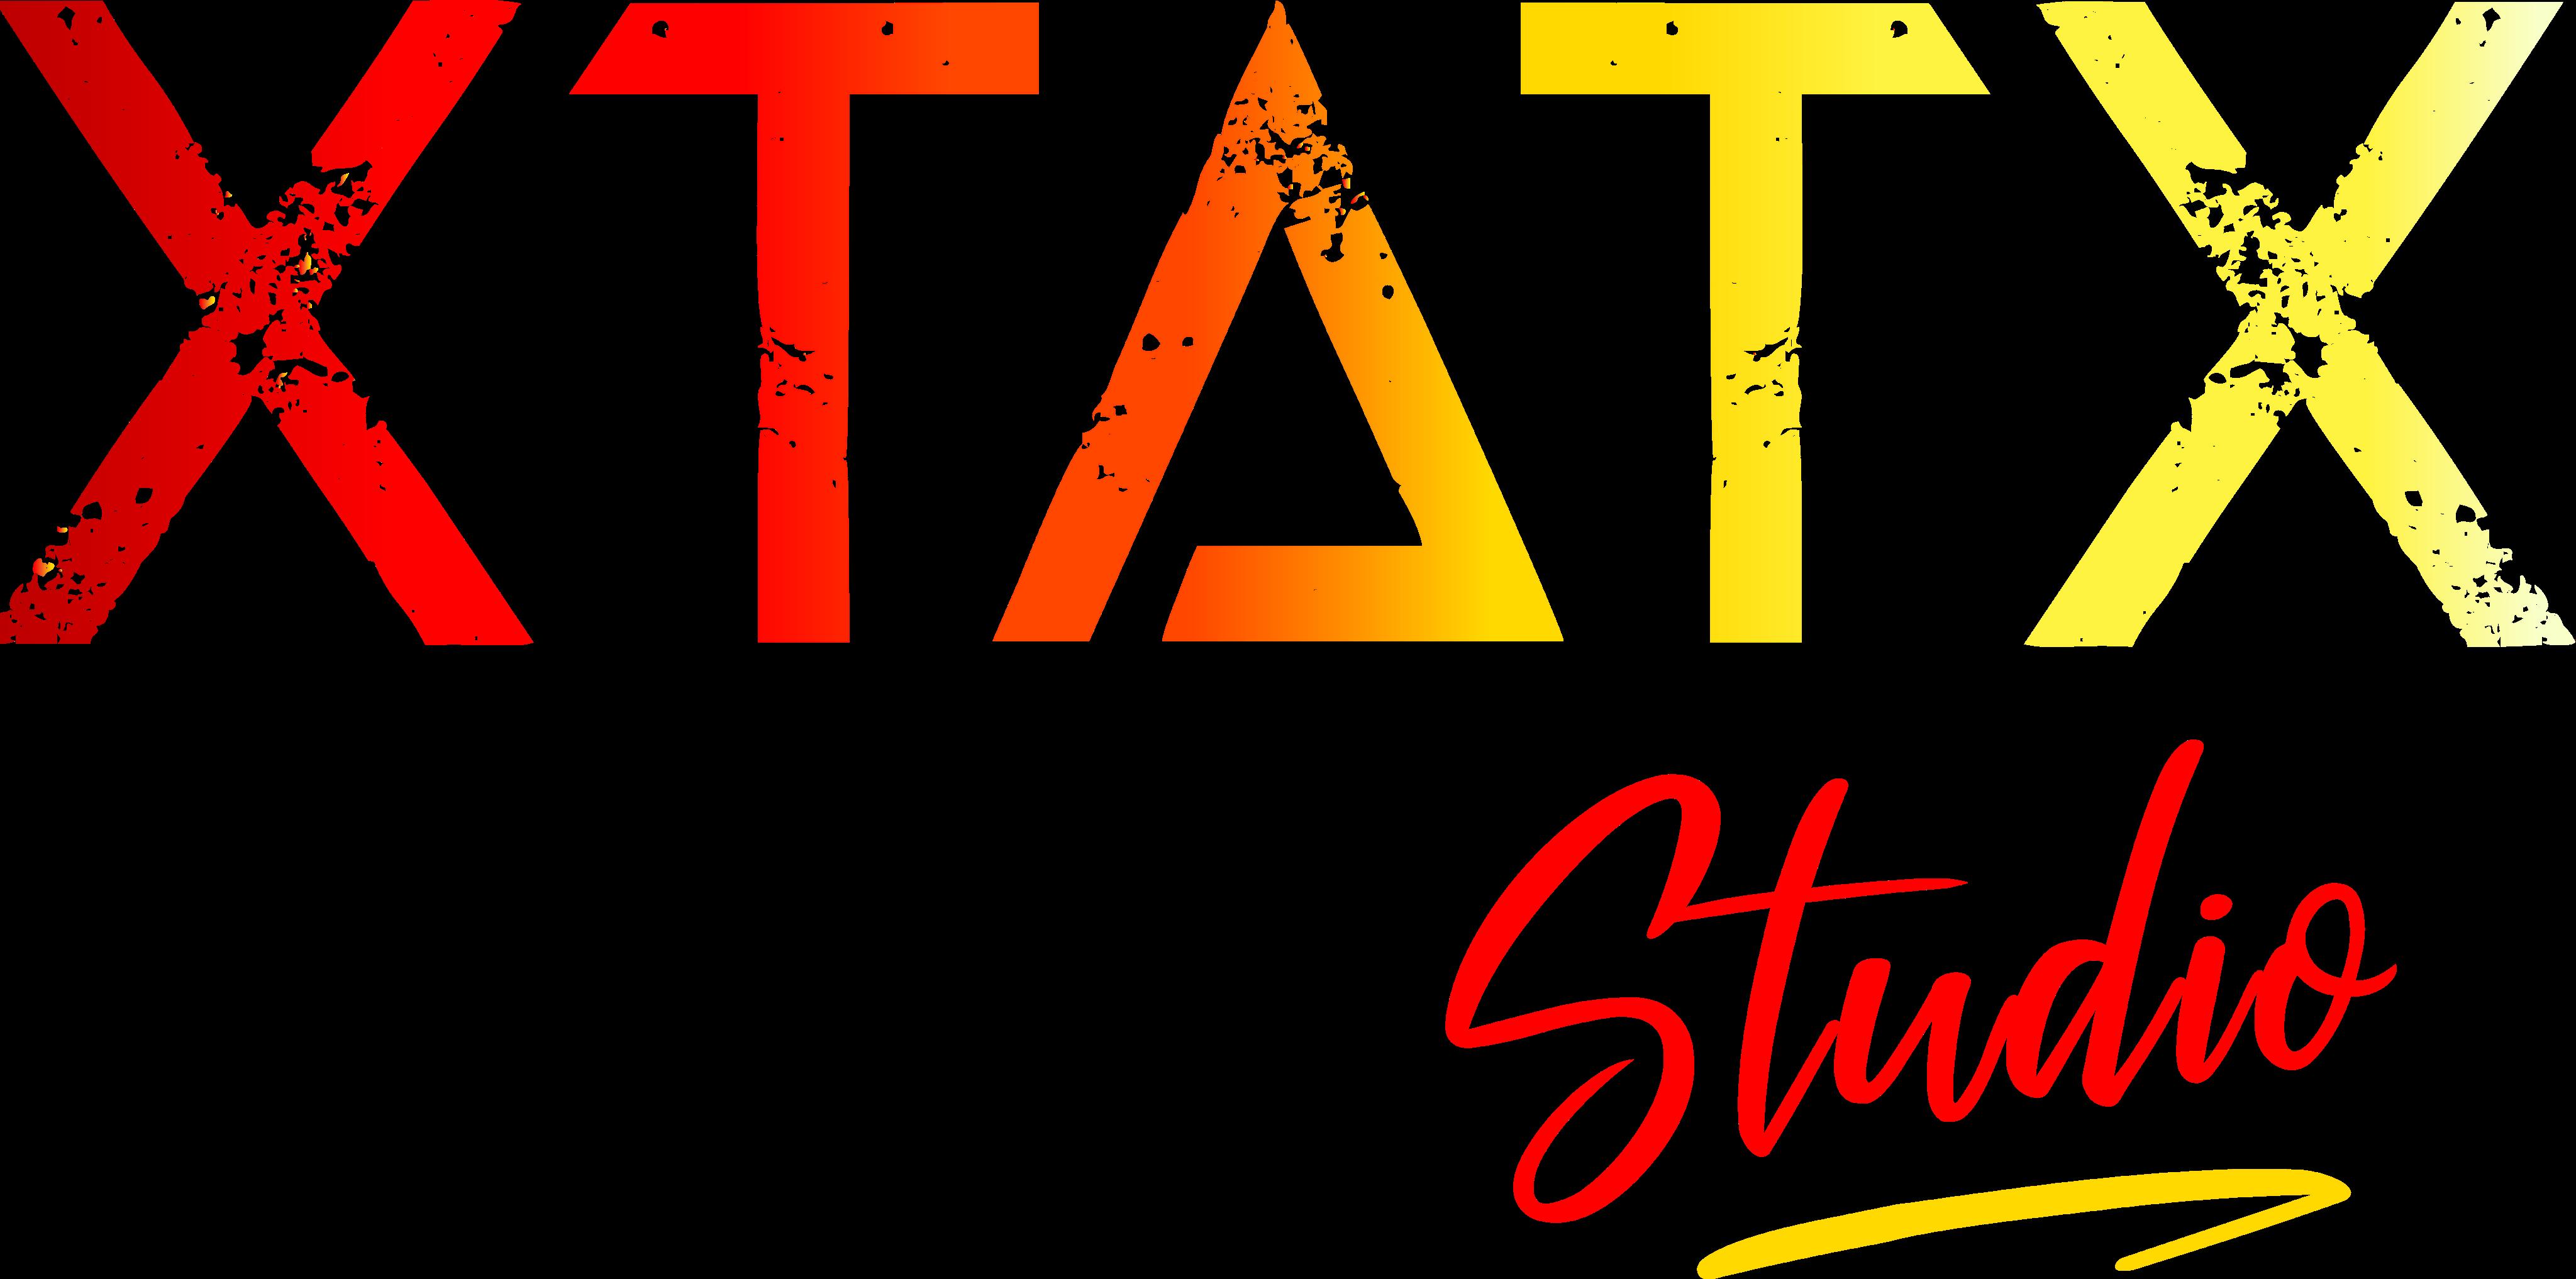 XTATX Studio